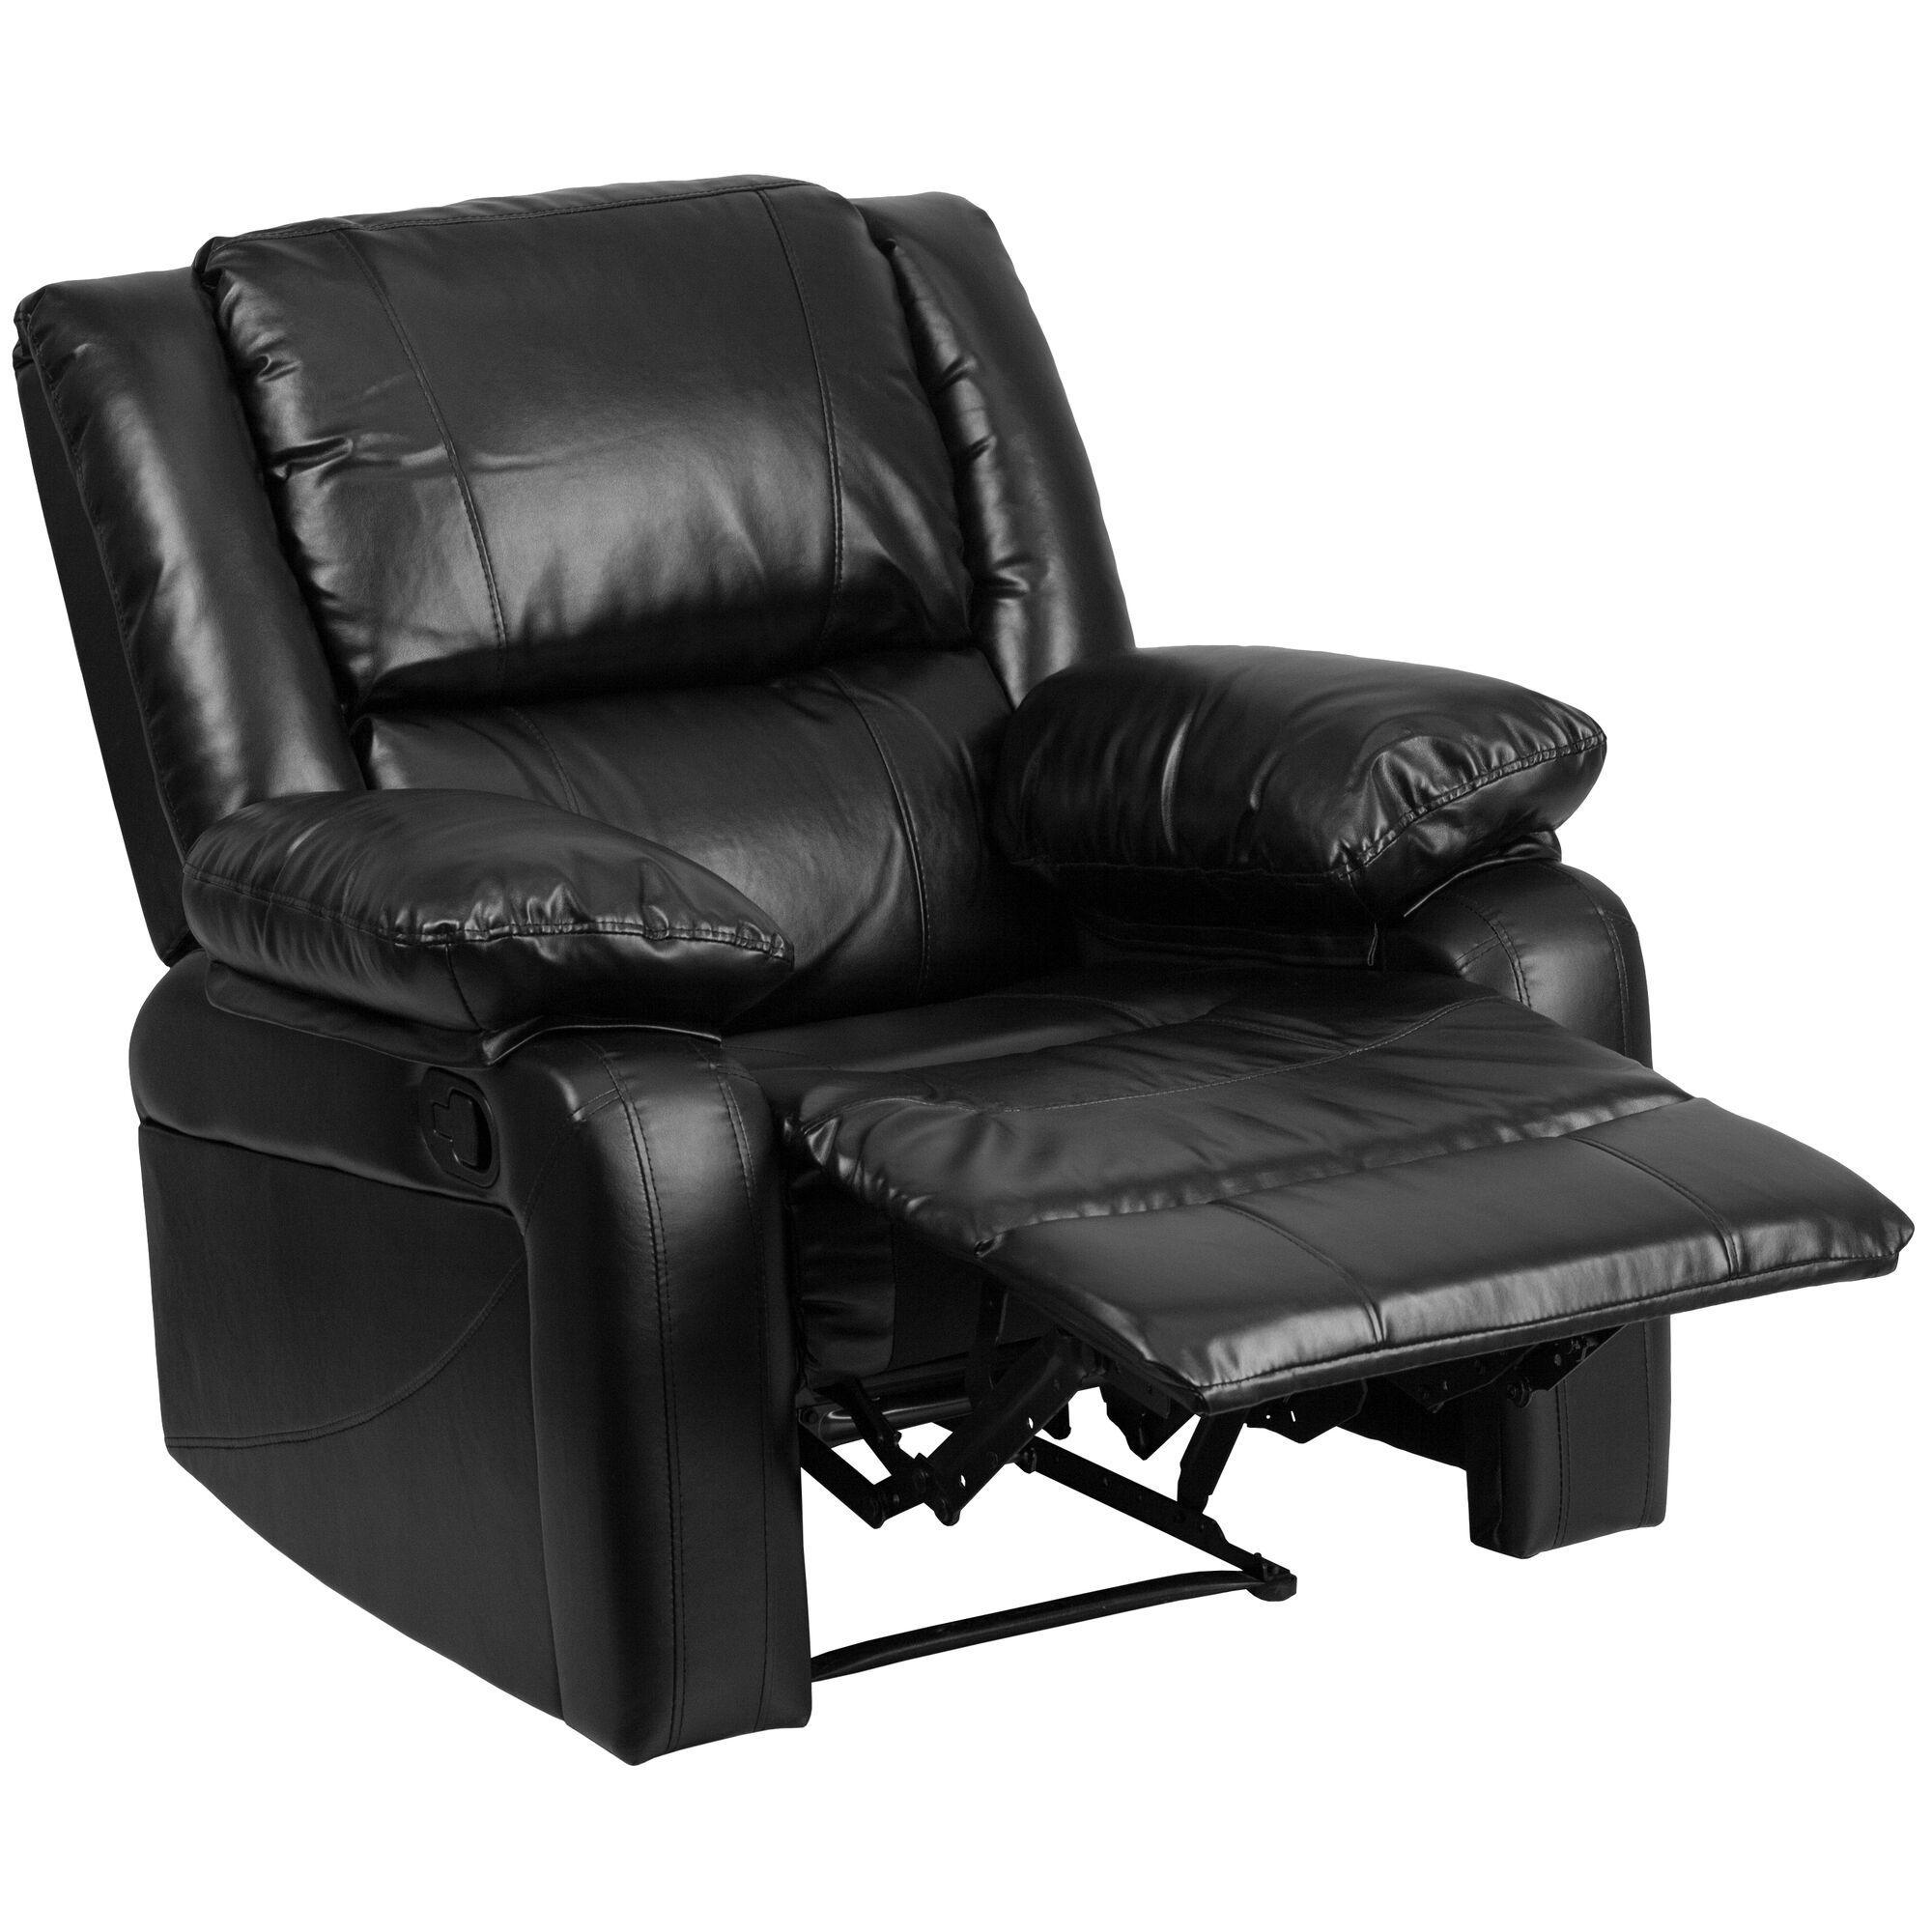 Fine Harmony Series Black Leather Recliner Cjindustries Chair Design For Home Cjindustriesco